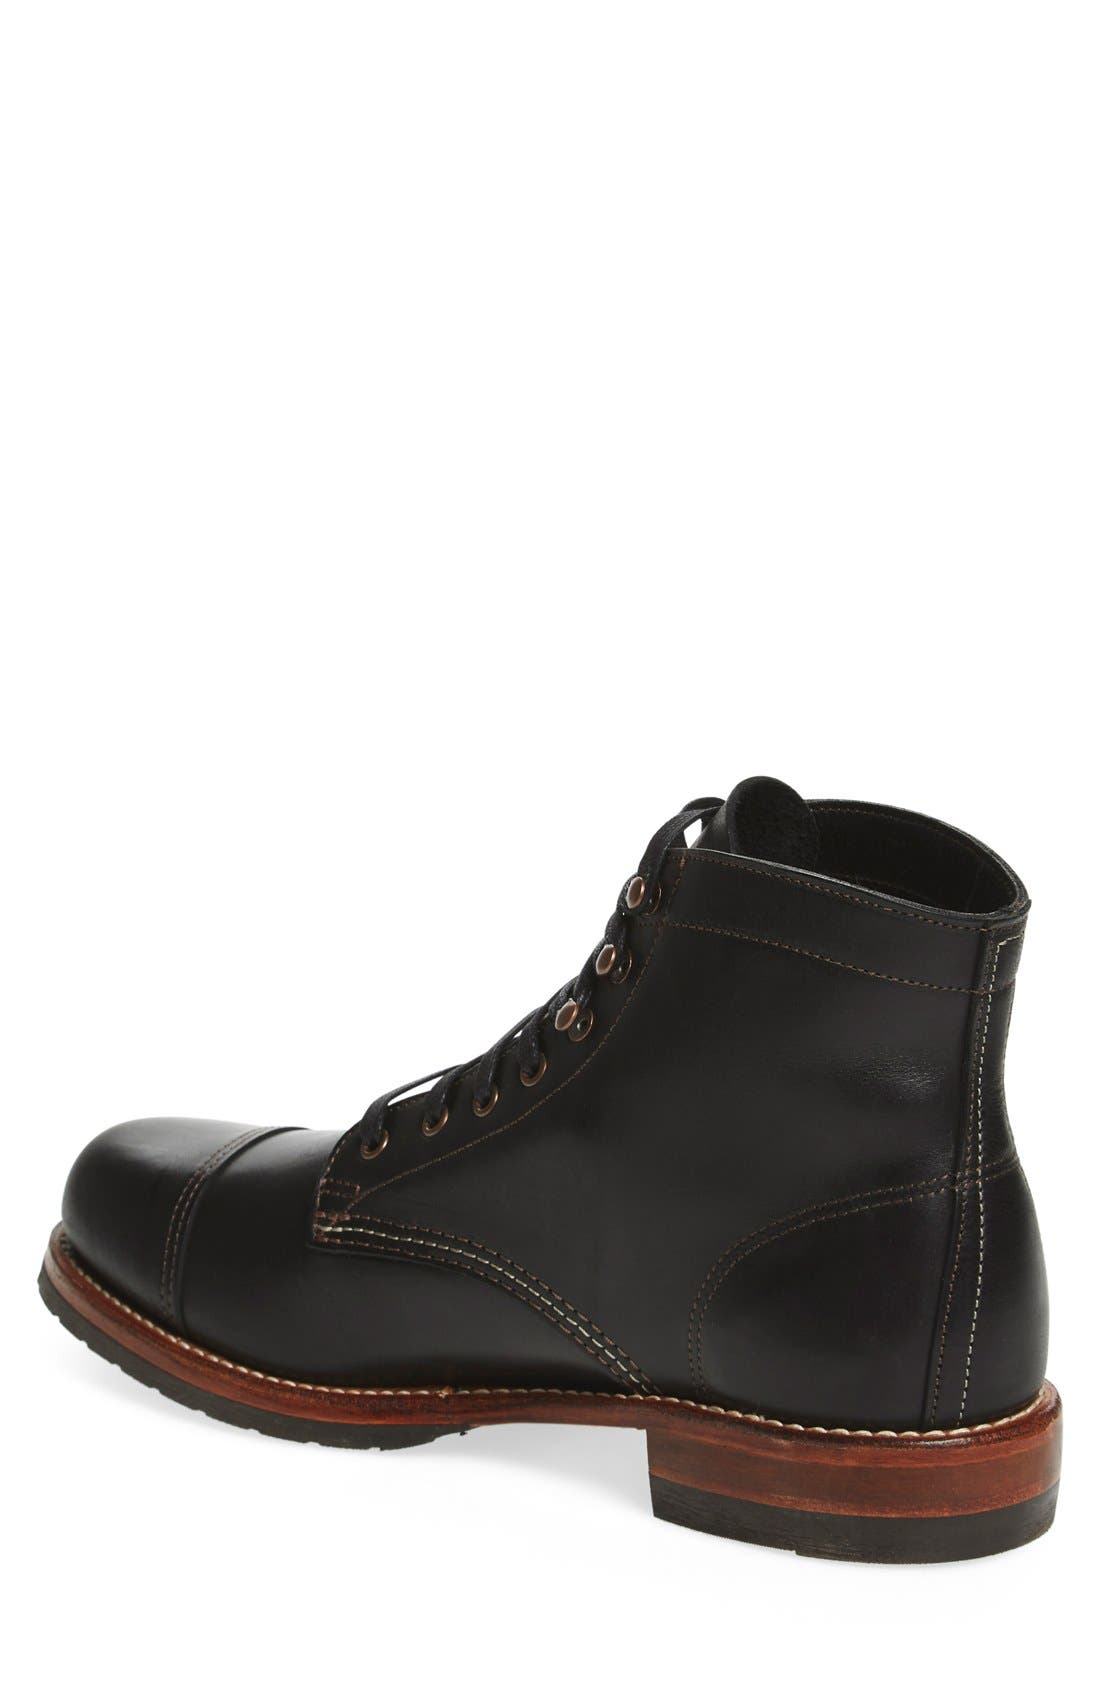 'Adrian' Cap Toe Boot,                             Alternate thumbnail 2, color,                             001